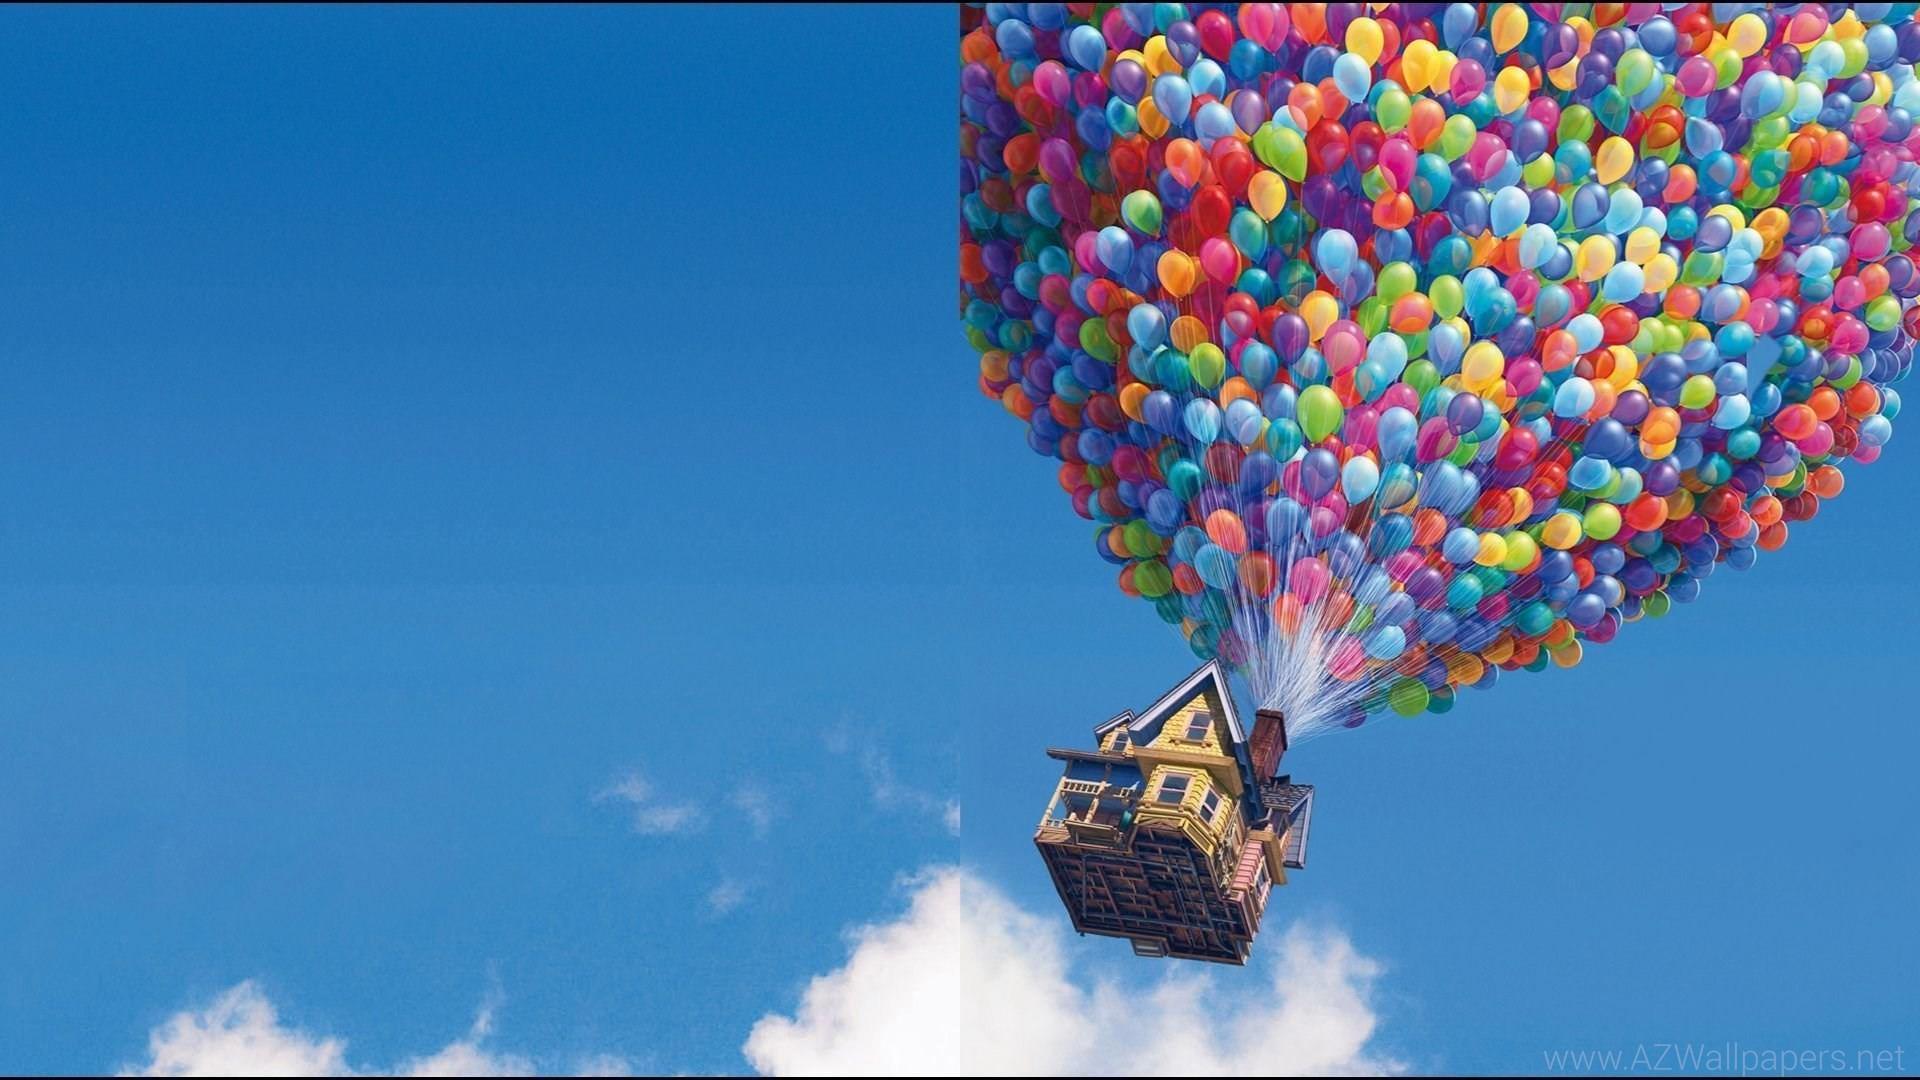 Up Wallpaper Pixar 62 Images